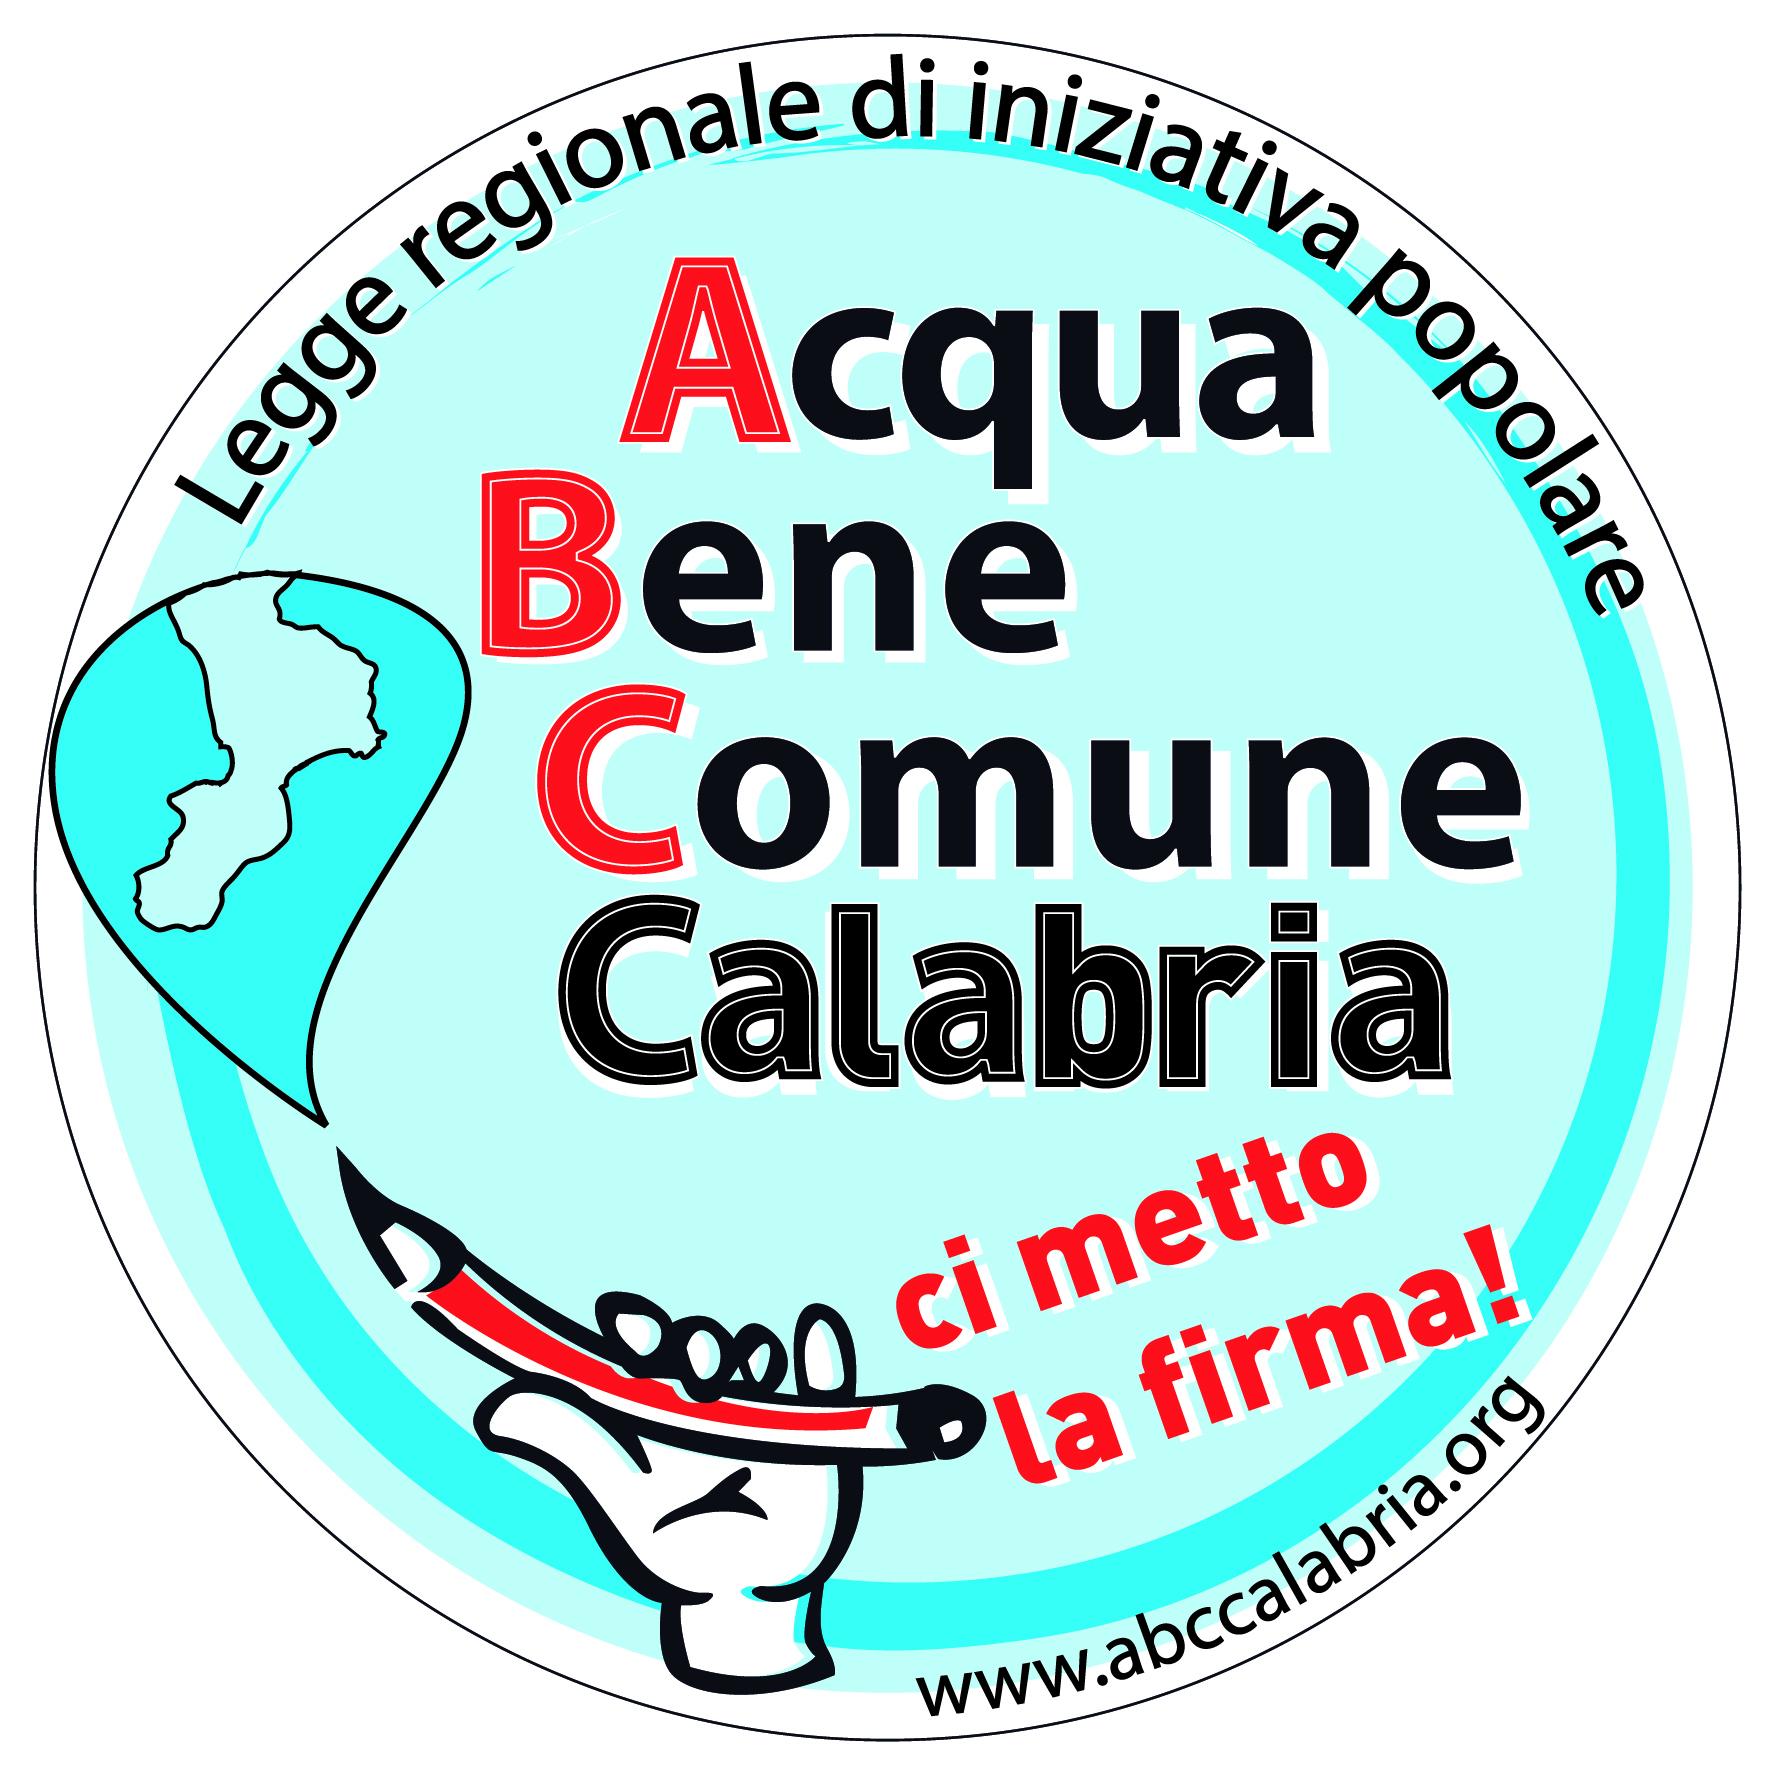 calabria_logo_campagna